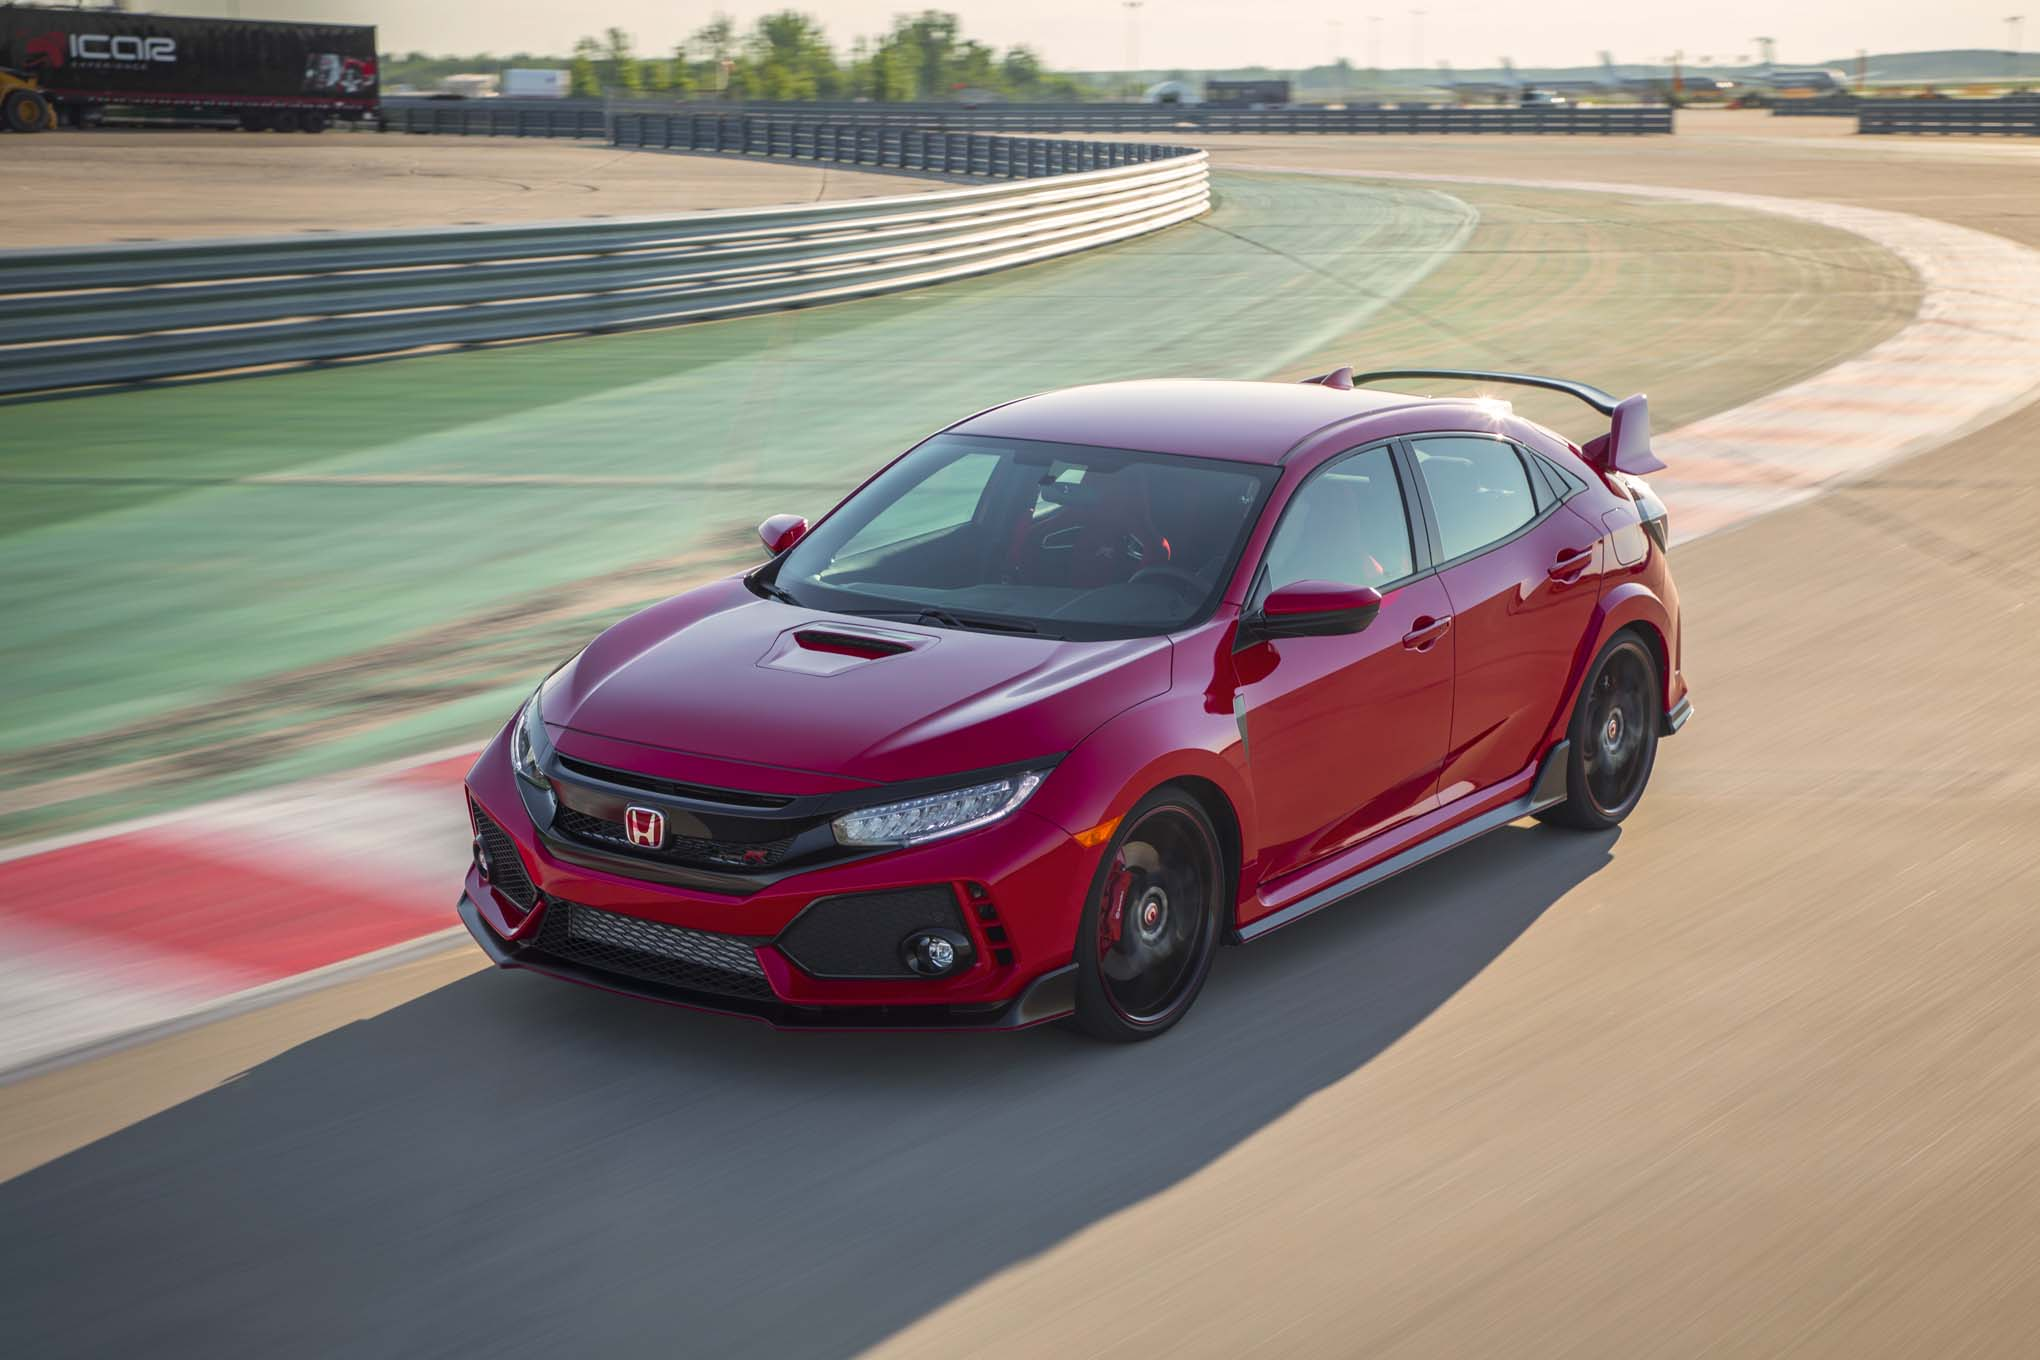 2017 Honda Civic Type R Front Three Quarter In Motion 12 1